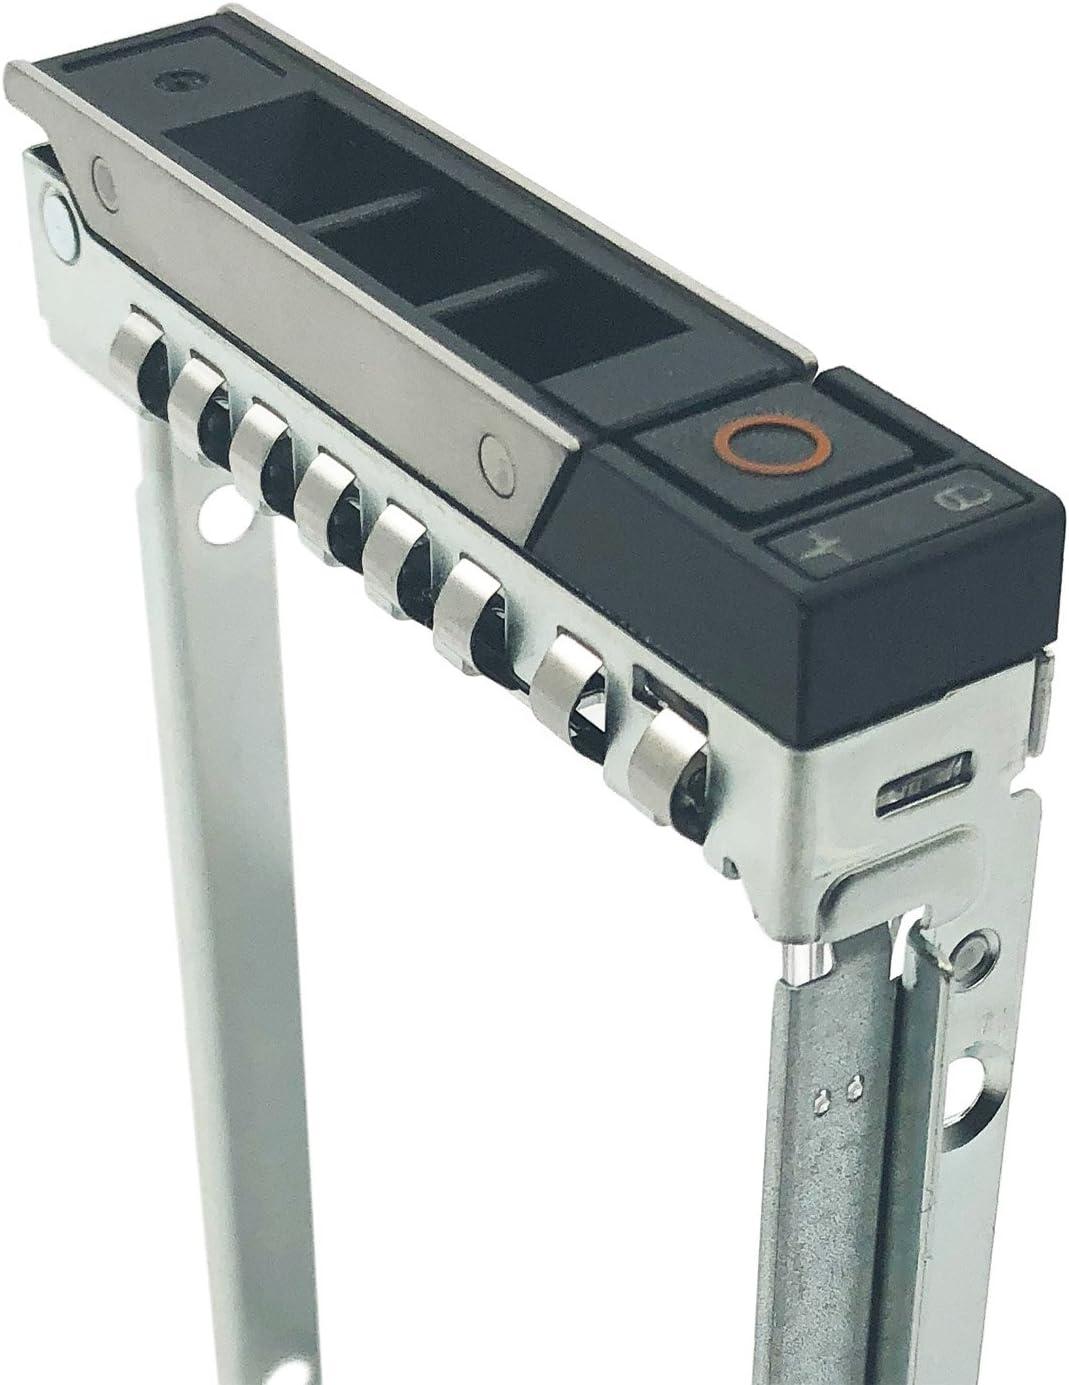 "2.5"" SSD SAS SATA NVMe Hard Drive Caddy for 14th Gen Dell PowerEdge Servers R440 R640 R740 R740xd R940 R6415 R7415 R7425 Hot Swap Bracket DXD9H"